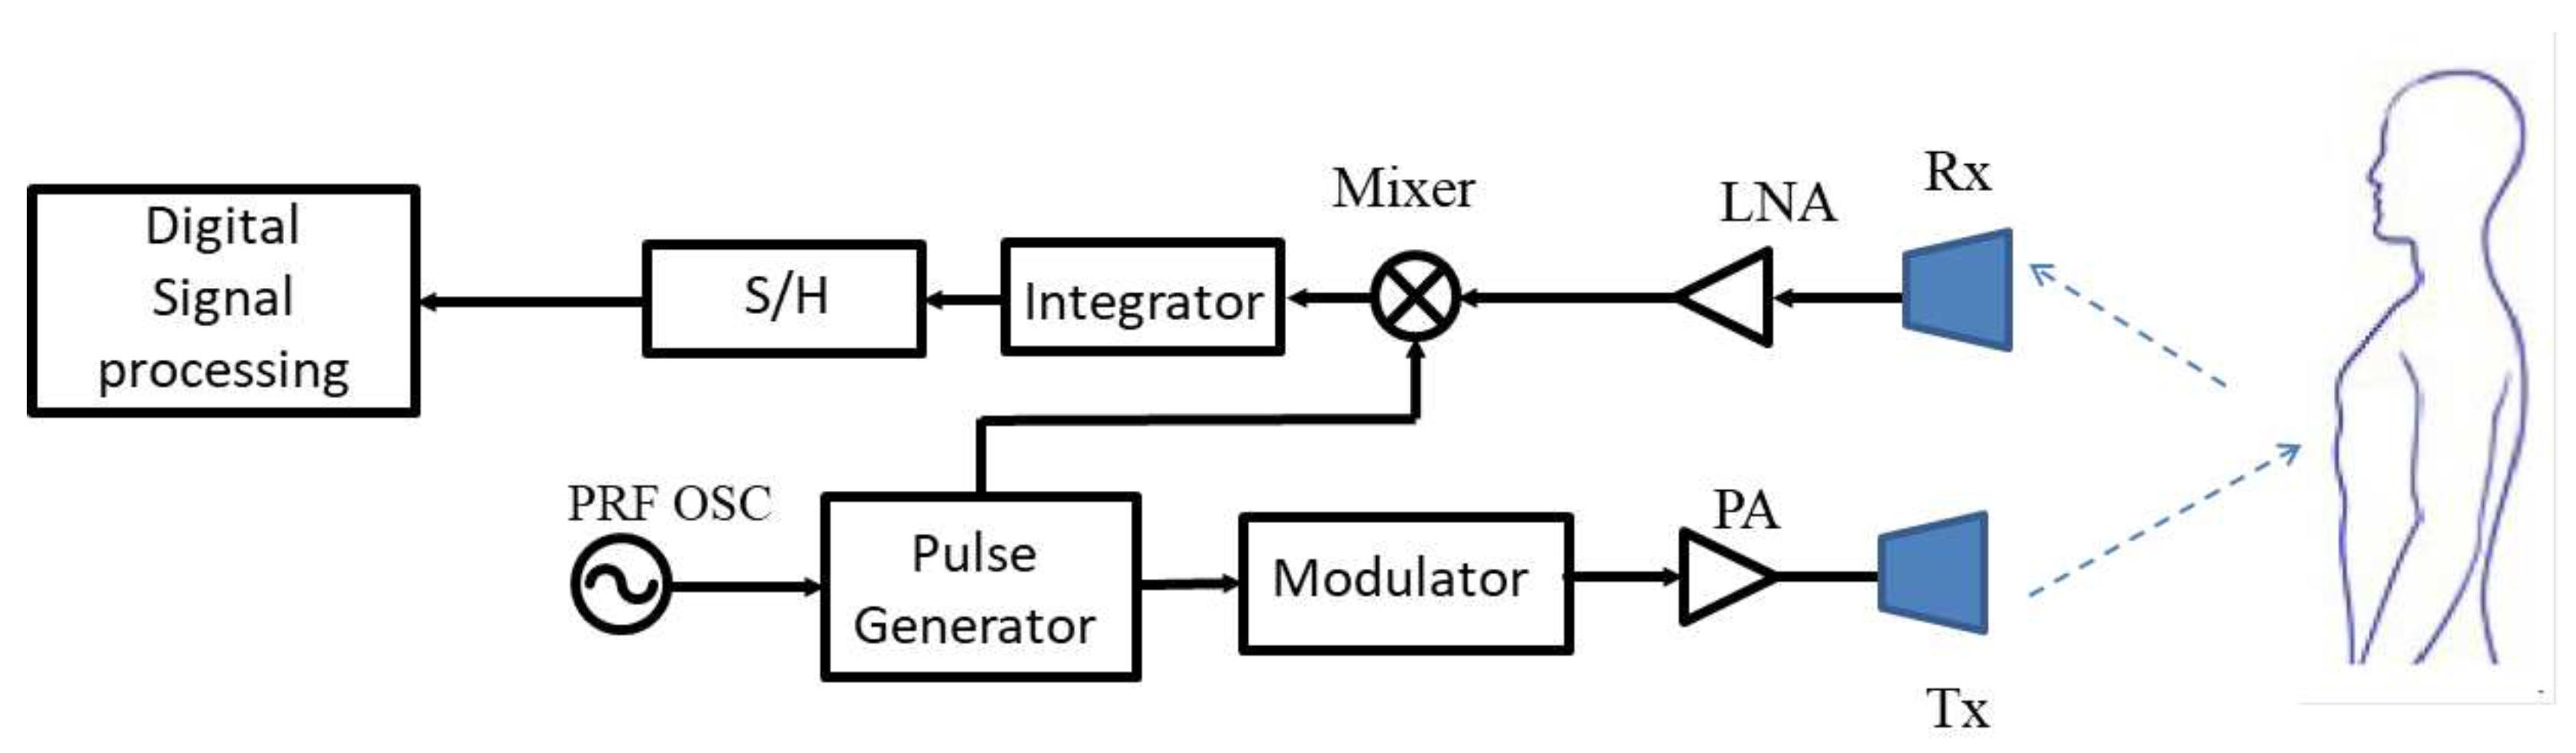 Functionsignalgenerator Signalprocessing Circuit Diagram - Wiring